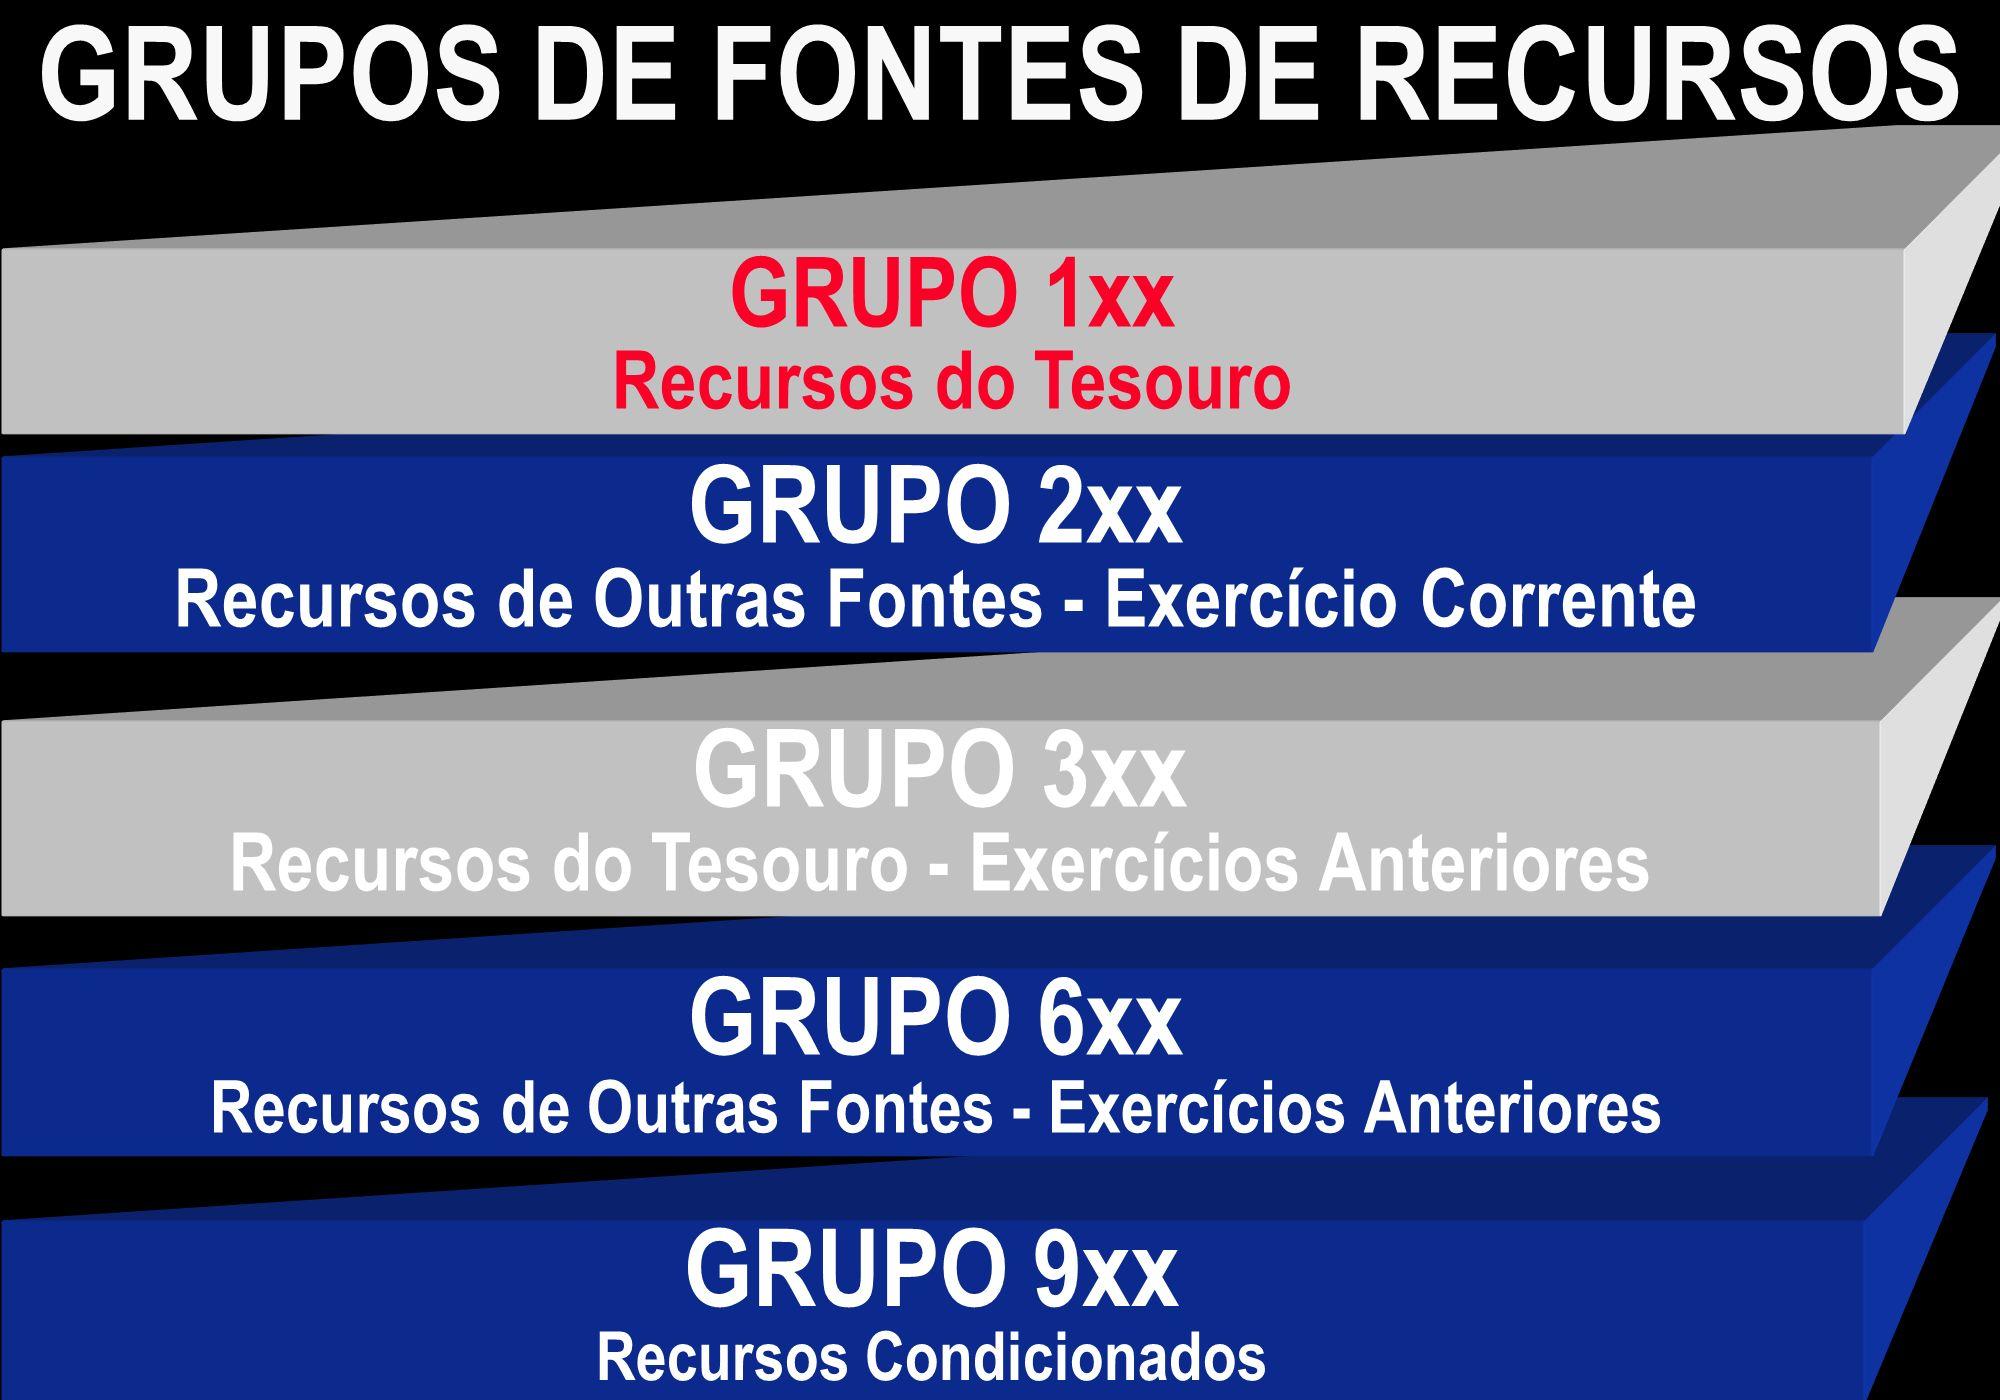 GRUPOS DE FONTES DE RECURSOS GRUPO 9xx Recursos Condicionados GRUPO 6xx Recursos de Outras Fontes - Exercícios Anteriores GRUPO 3xx Recursos do Tesour